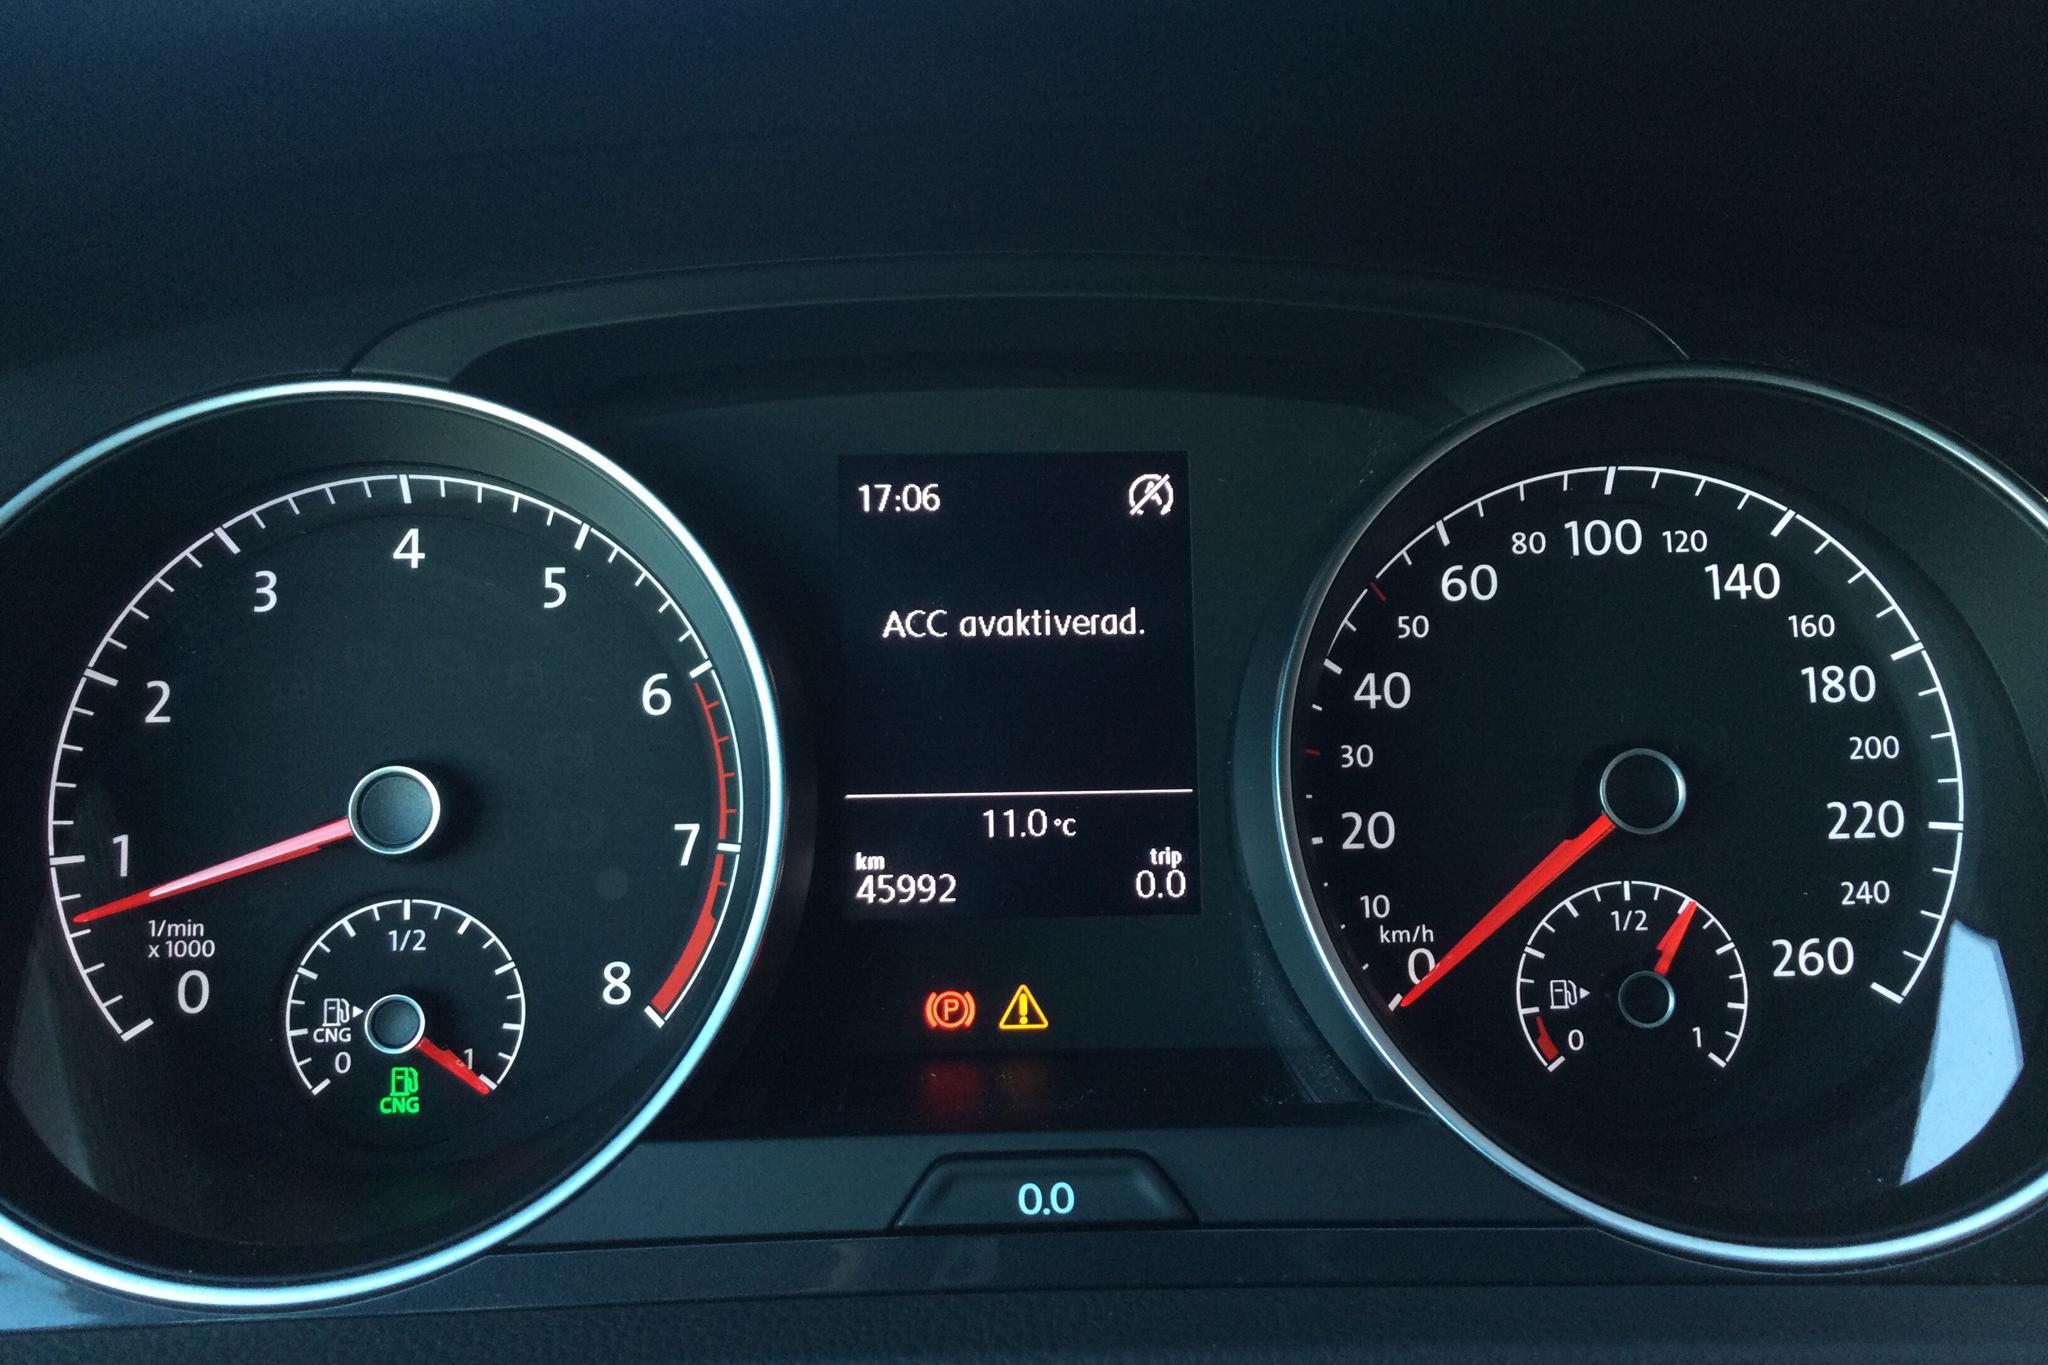 VW Golf VII 1.4 TGI BlueMotion Sportscombi (110hk) - 4 599 mil - Manuell - svart - 2018